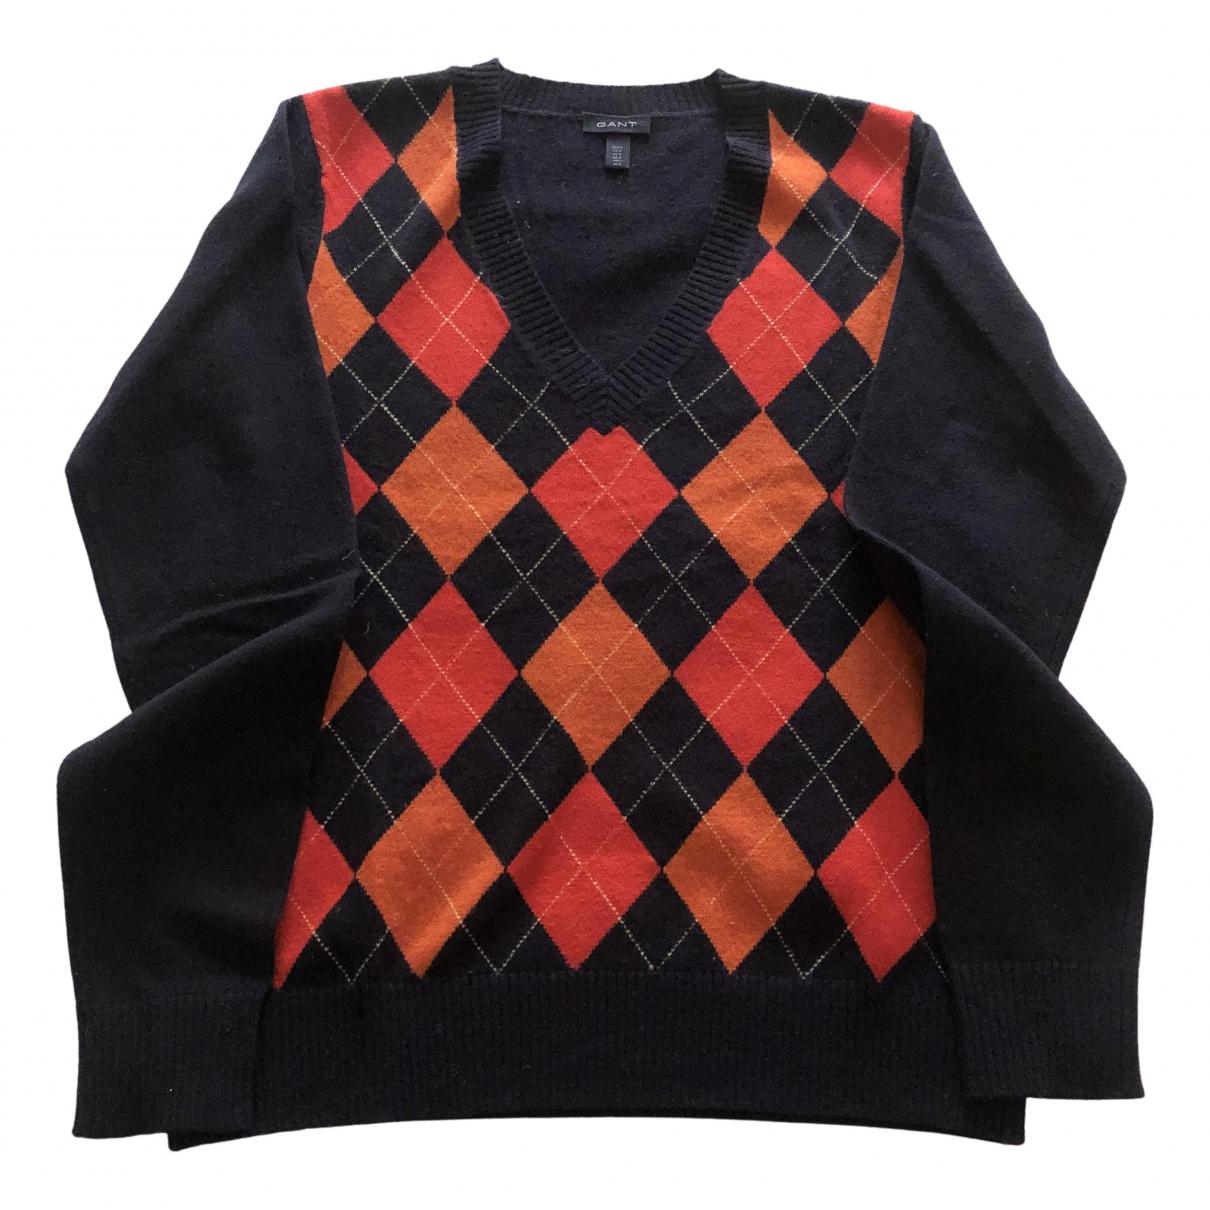 Gant N Blue Knitwear & Sweatshirts for Men M International